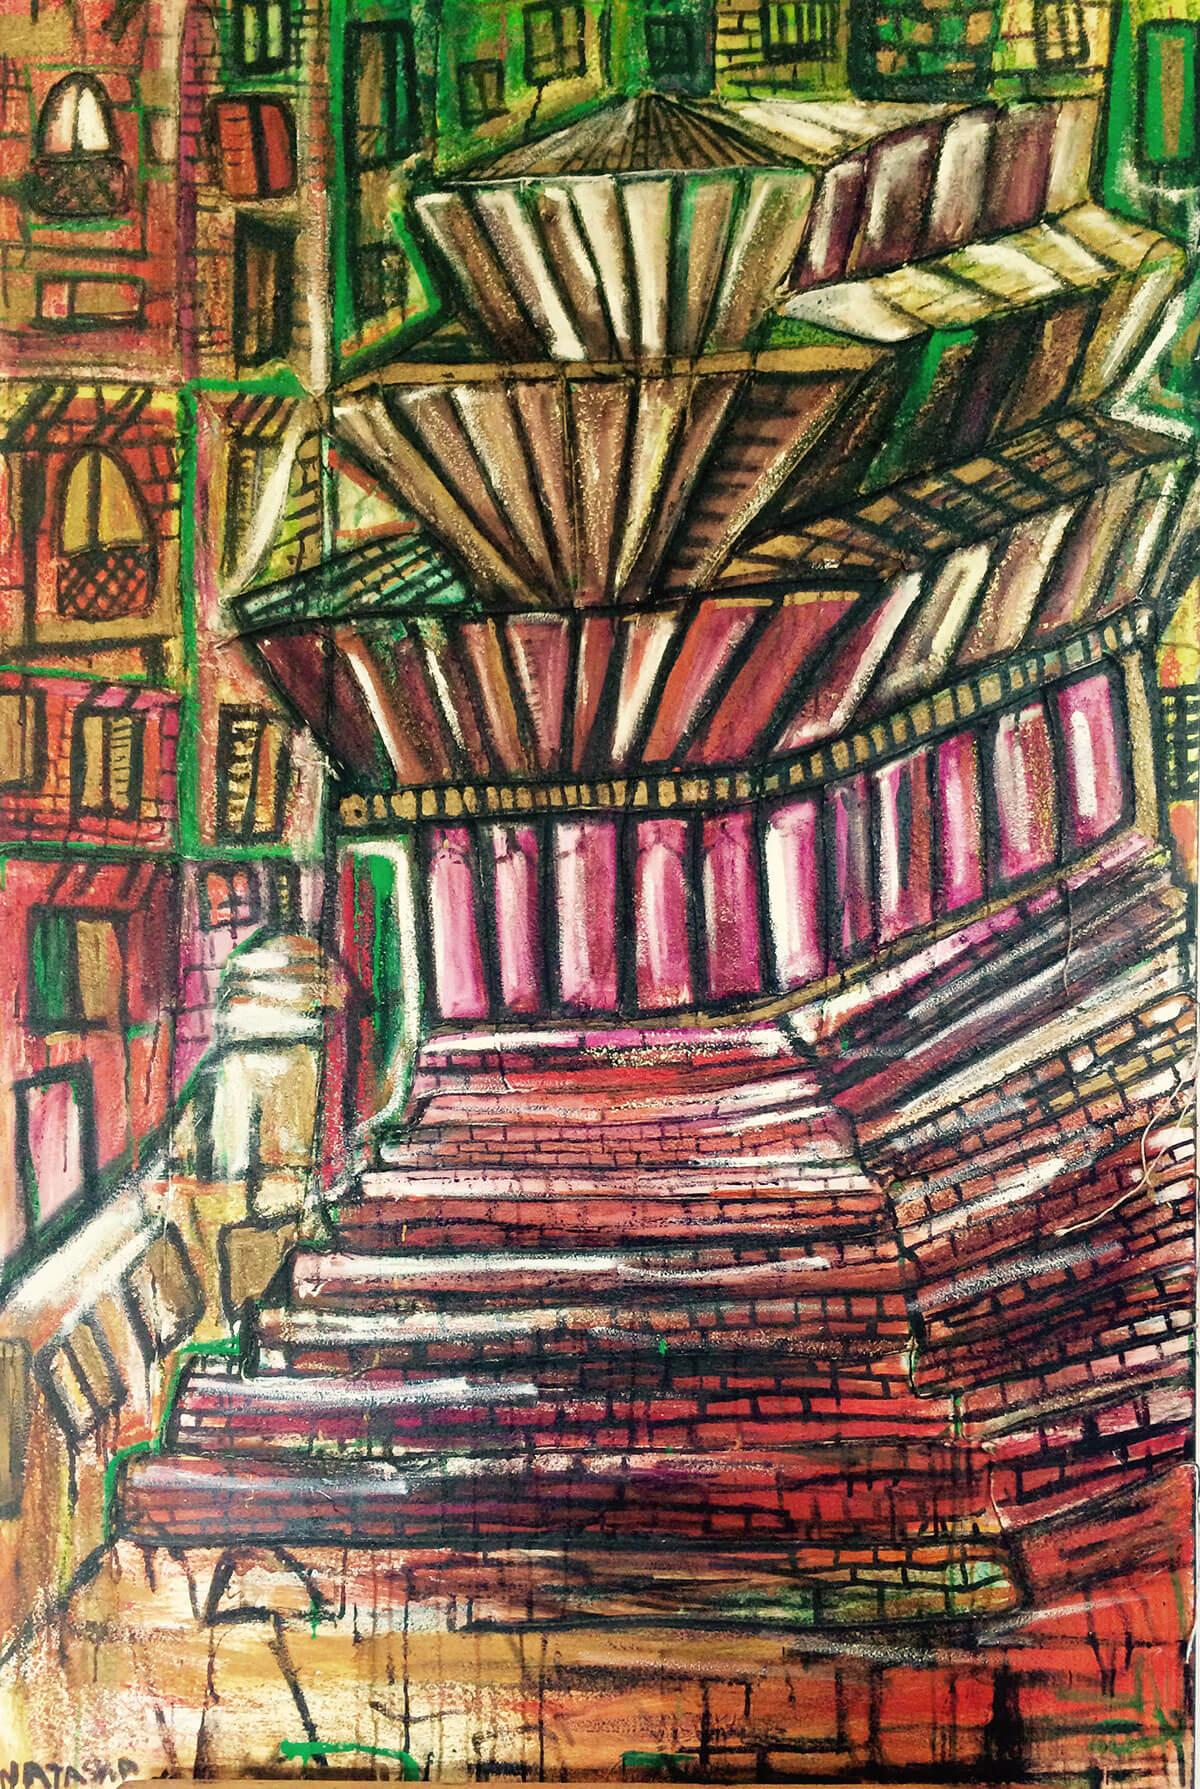 Durbar-Square-Temple-Painting-Natasha-Jade